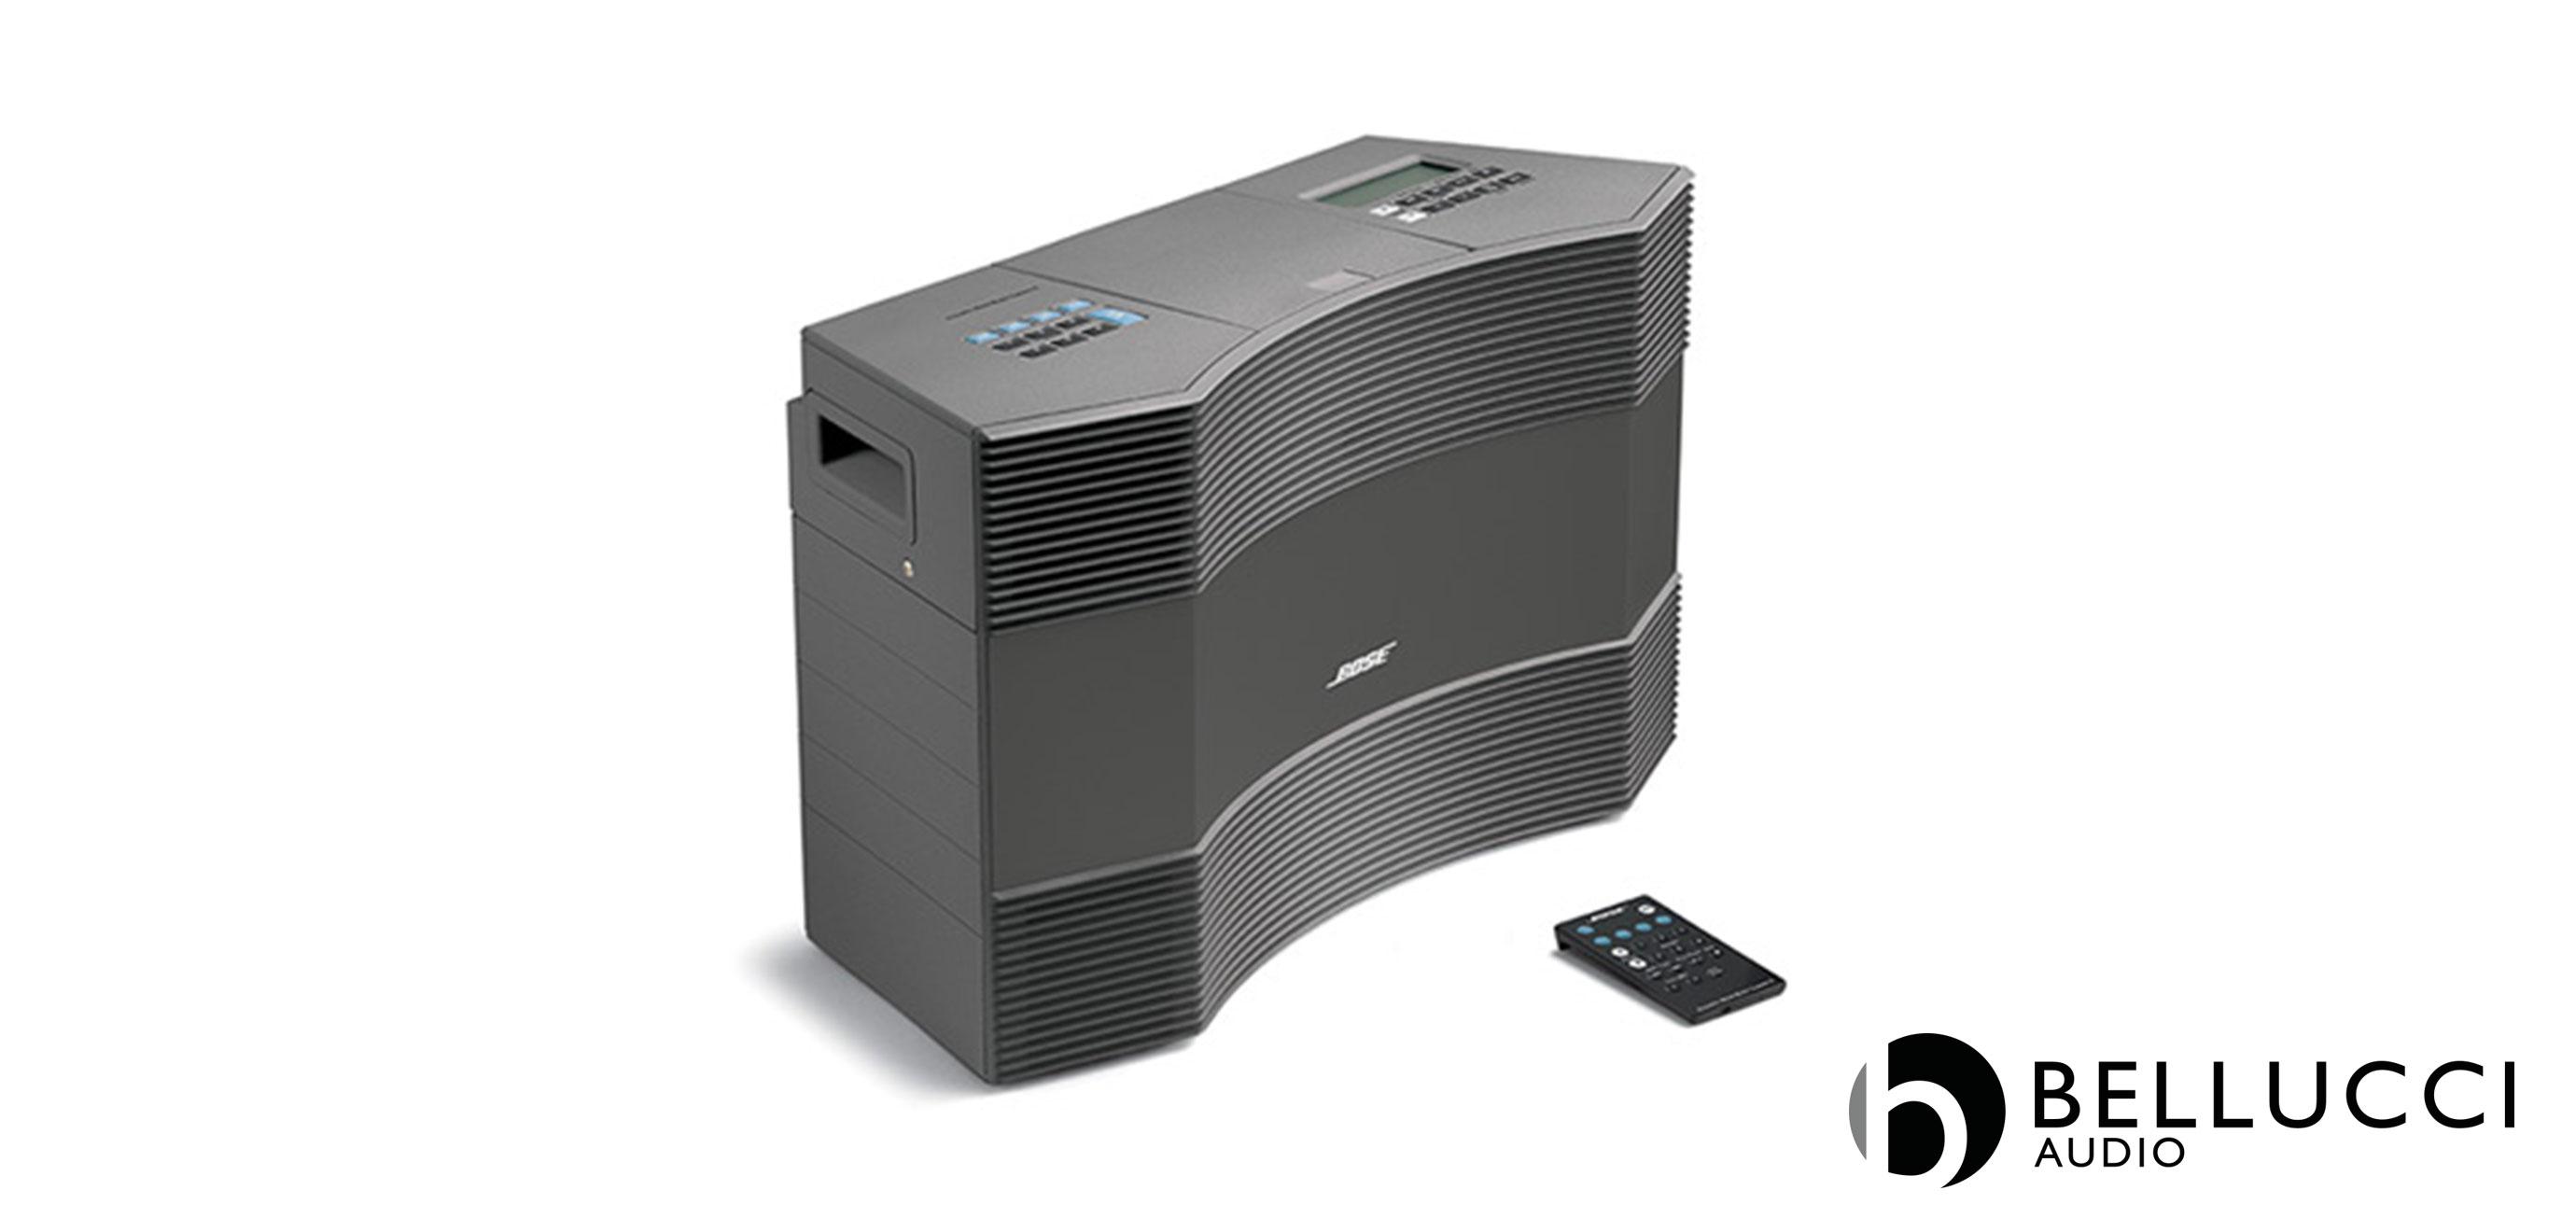 bellucci audio bose acoustic wave music system ii. Black Bedroom Furniture Sets. Home Design Ideas